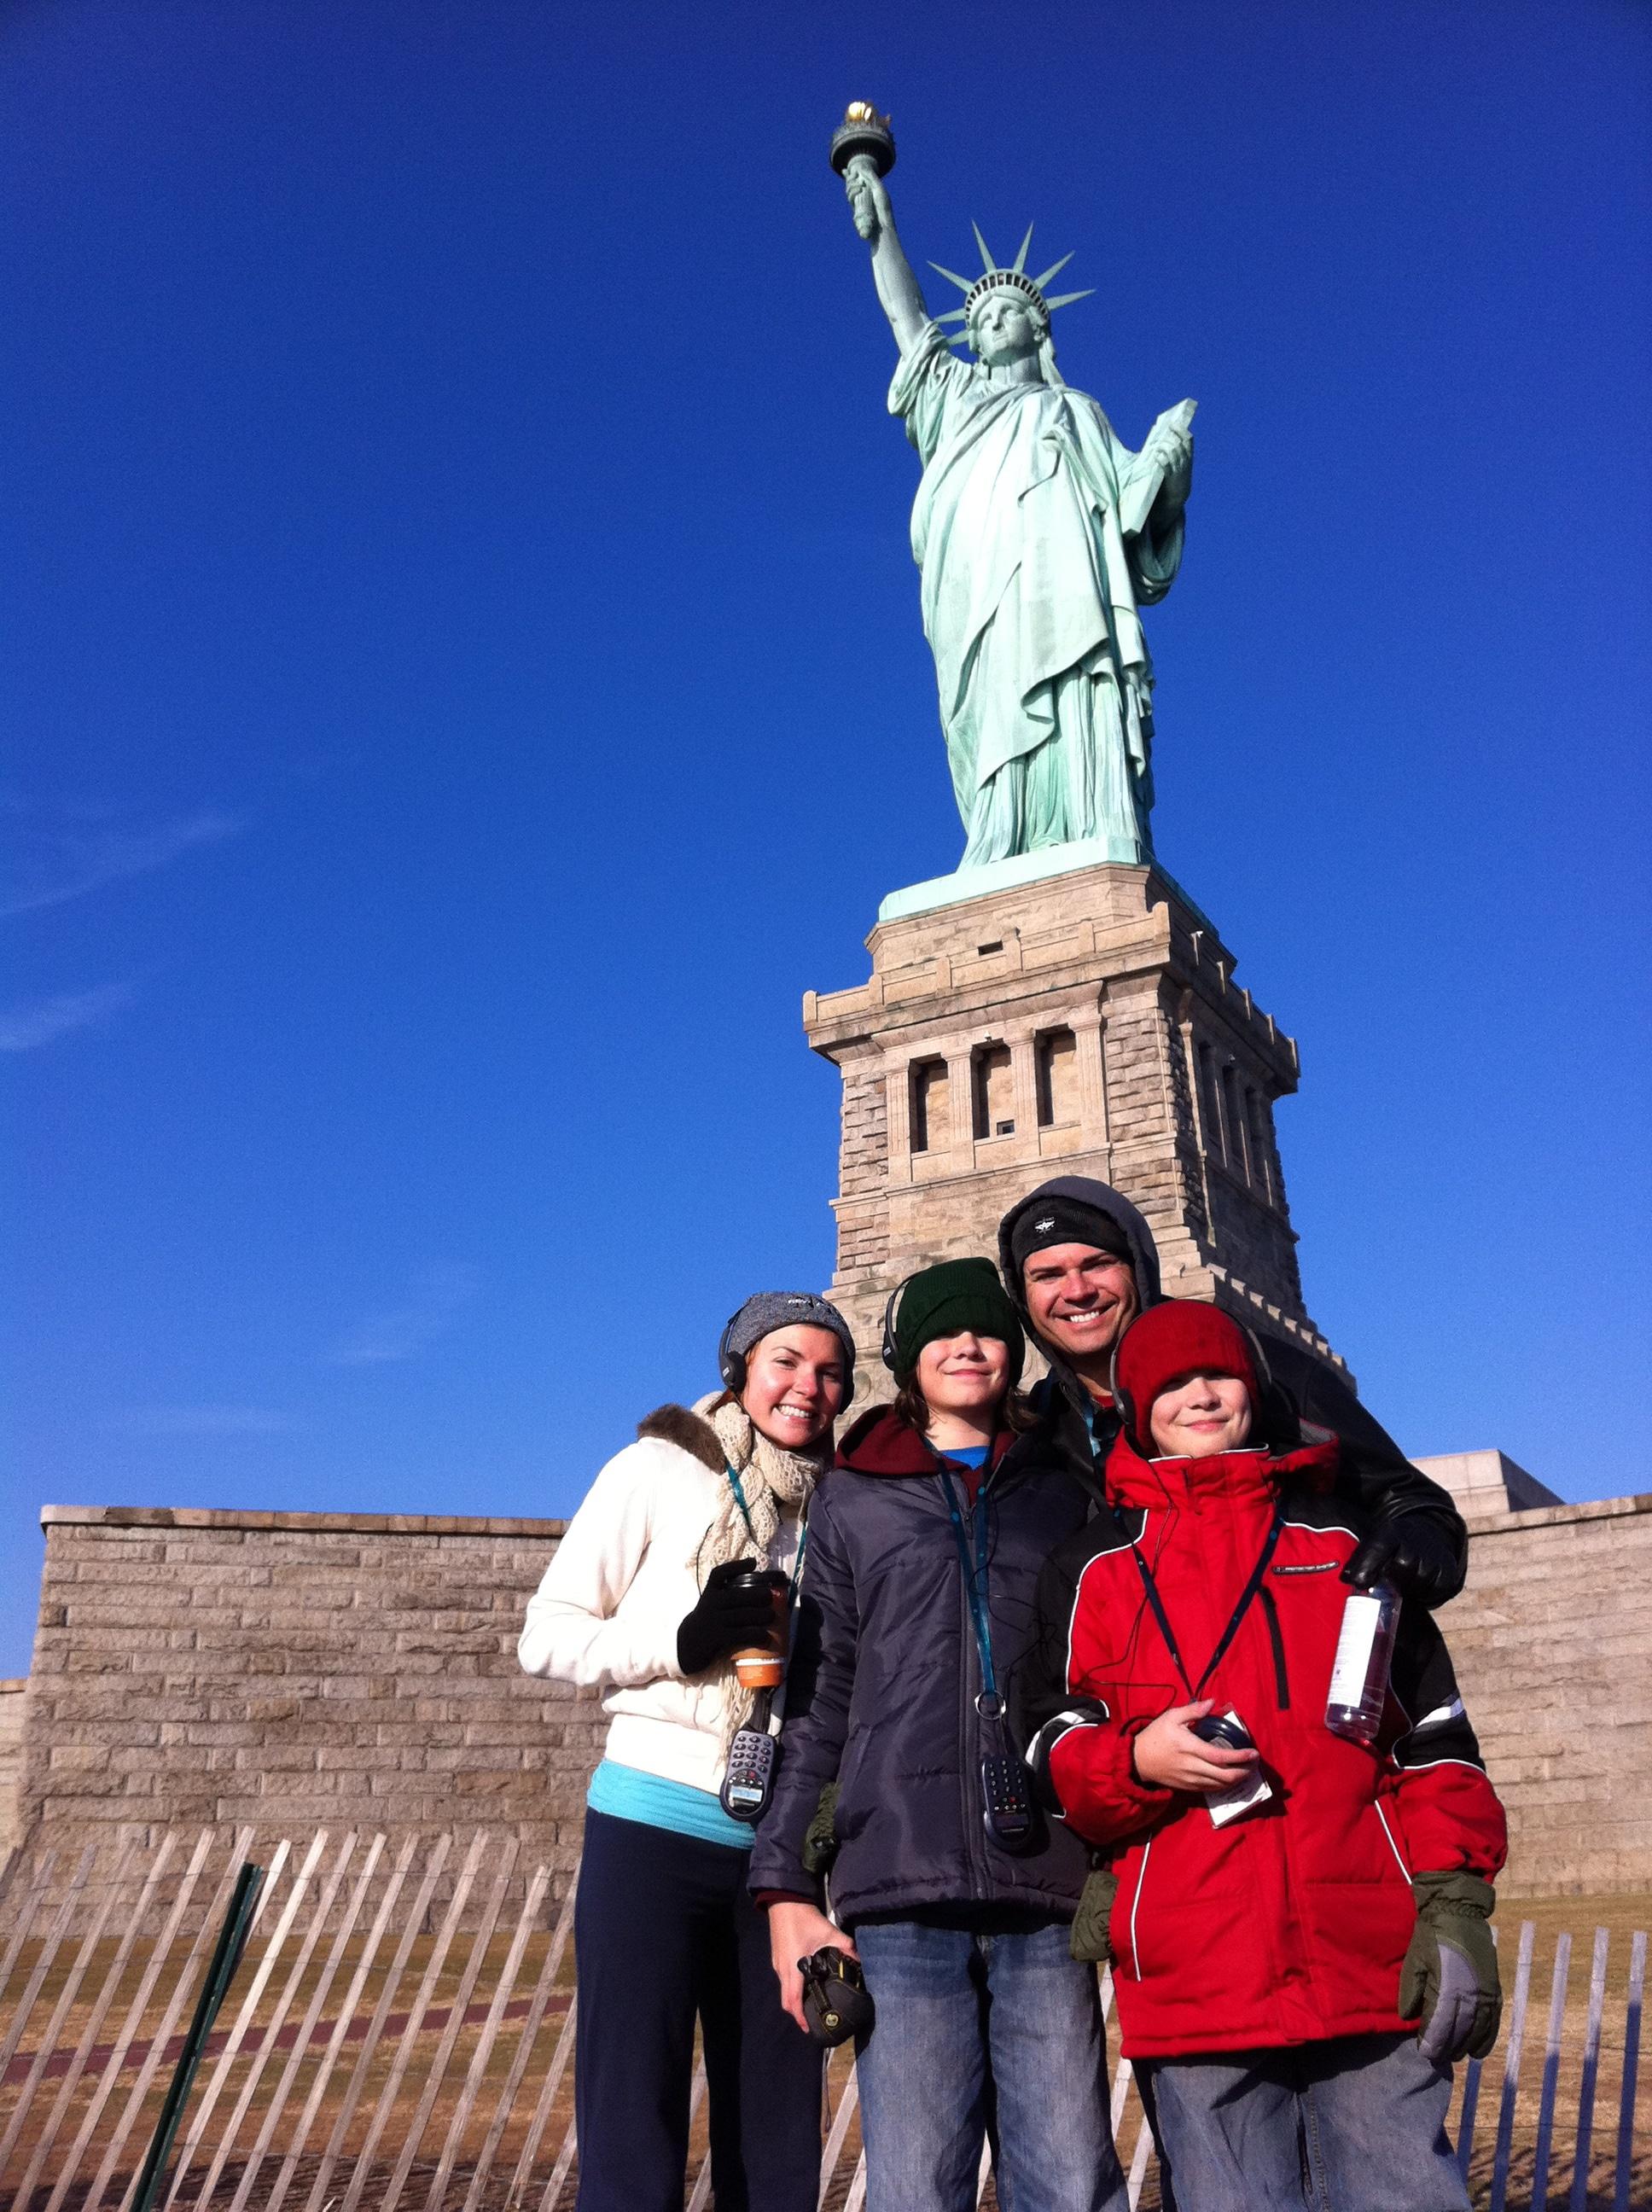 My trip to new york